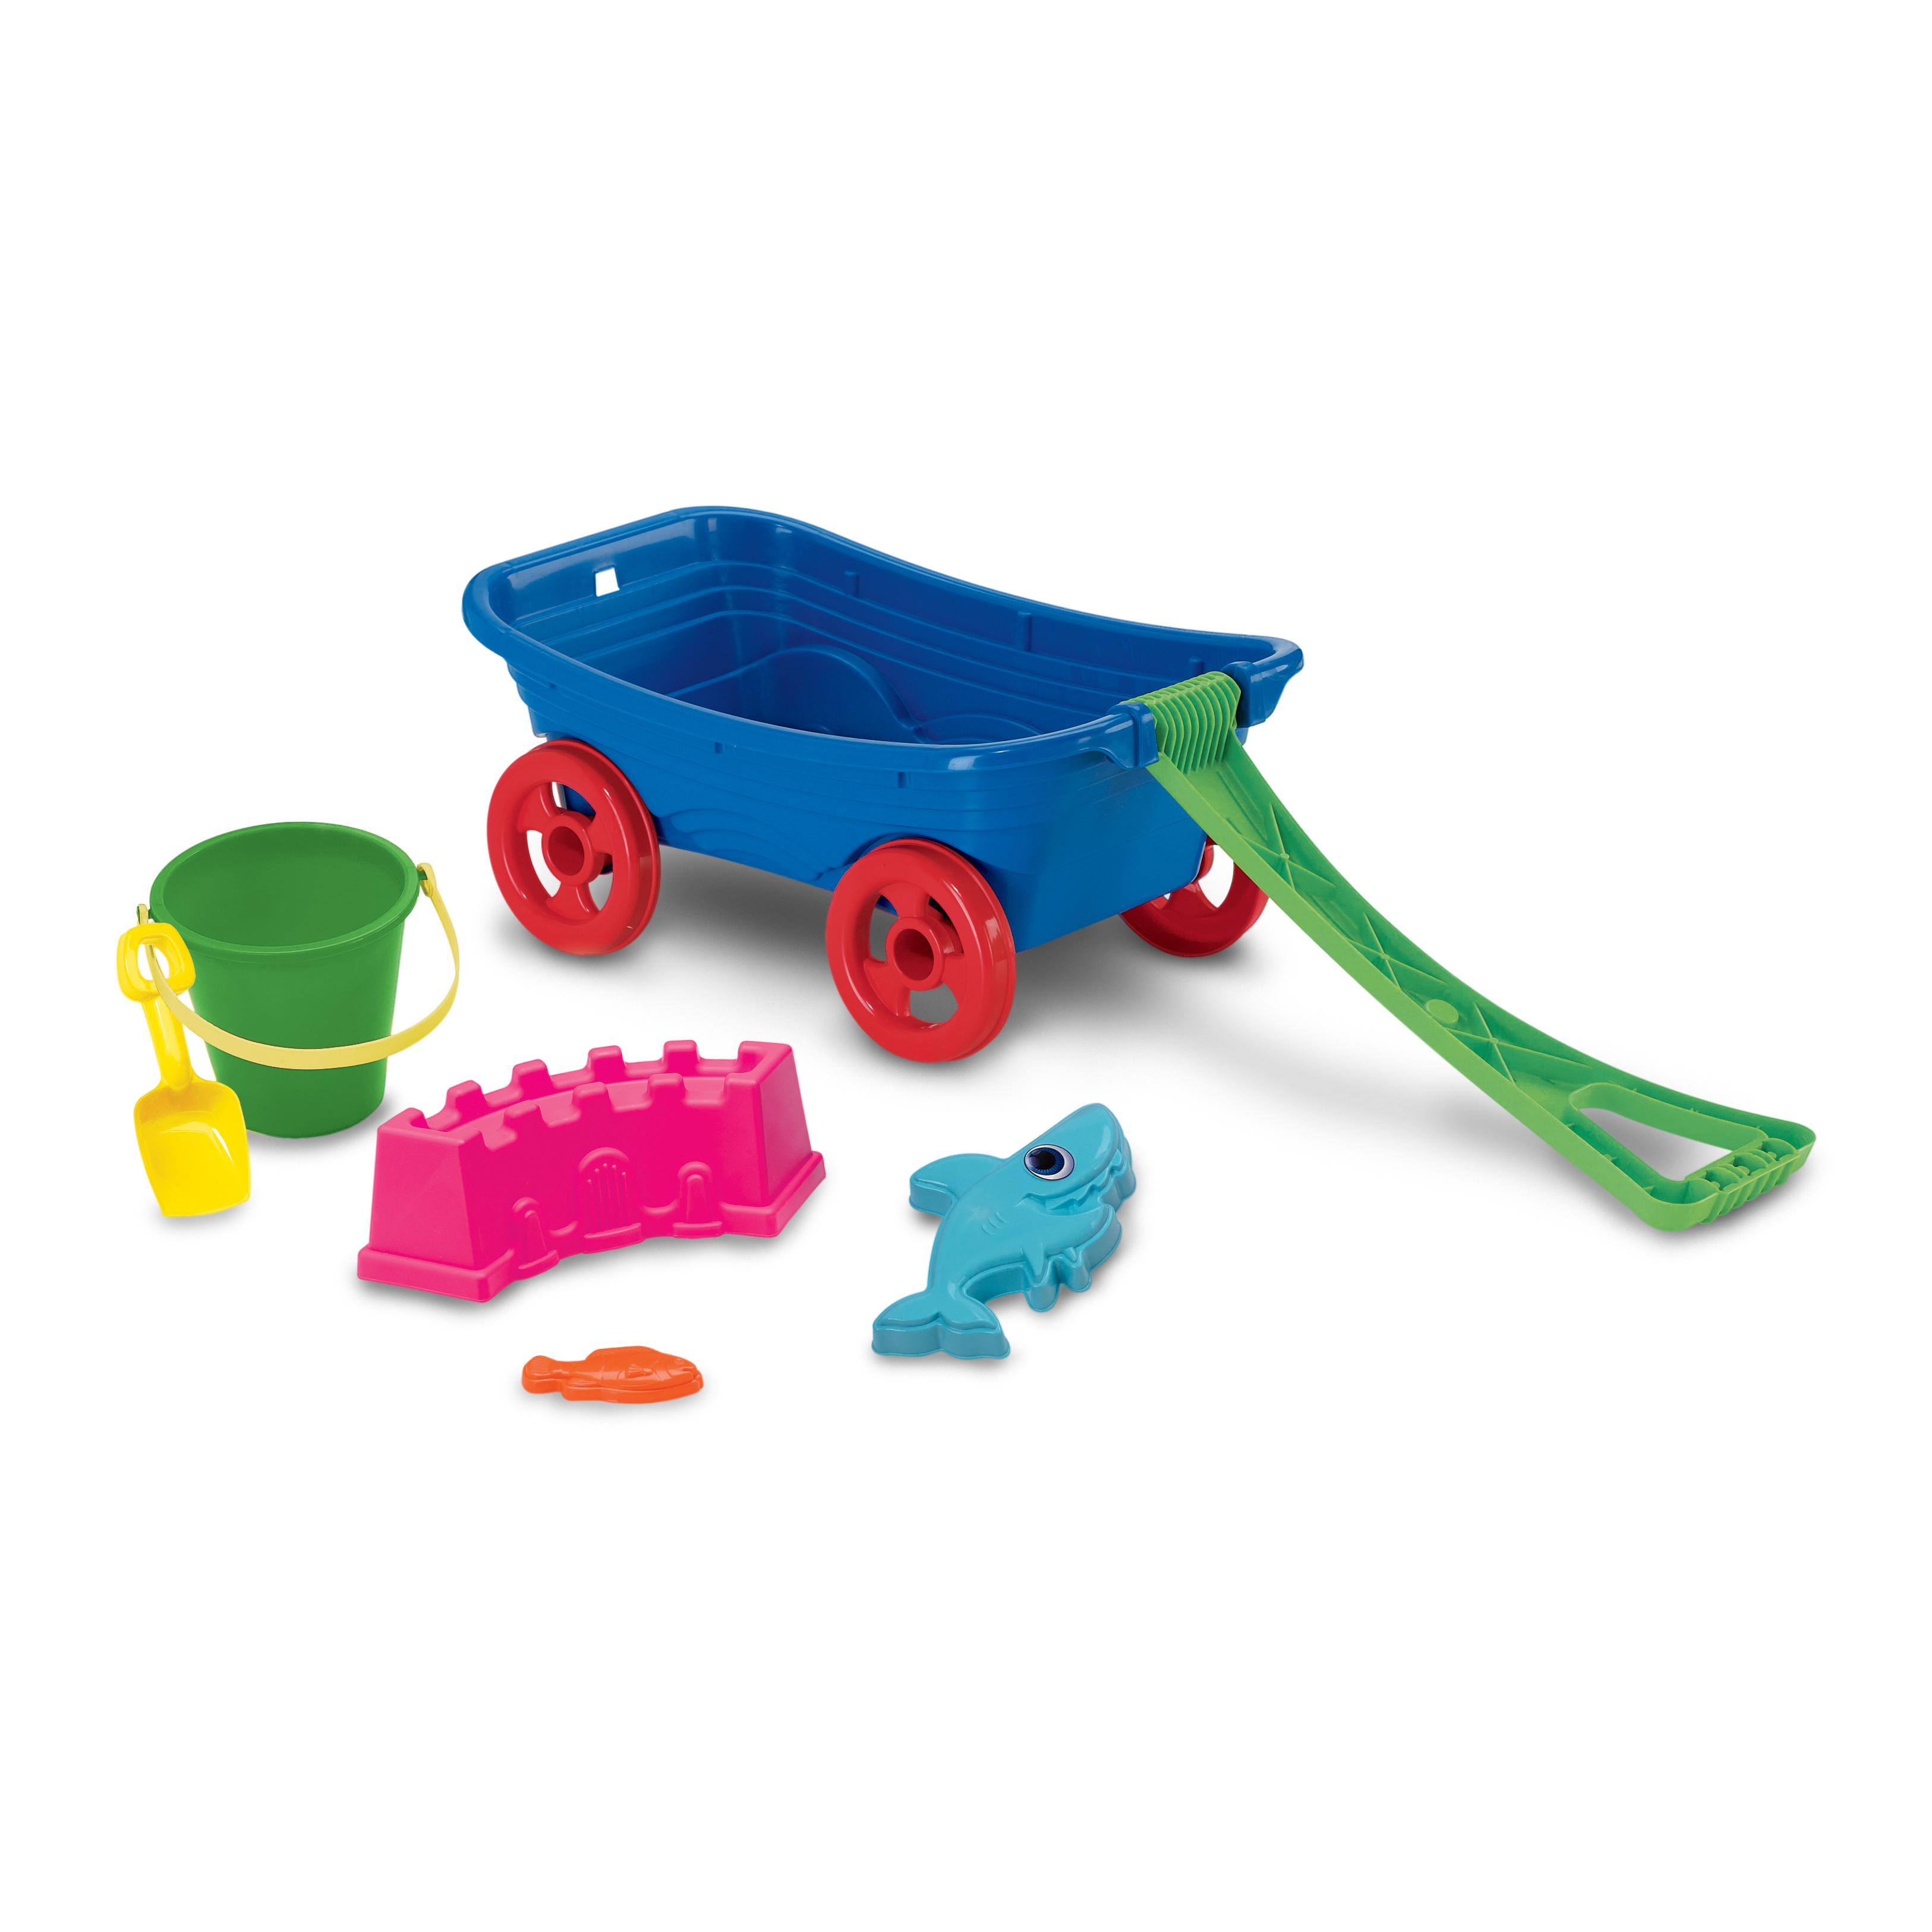 Plastic SetAmerican Beachcomber Wagon Inc Toys dCBxeor